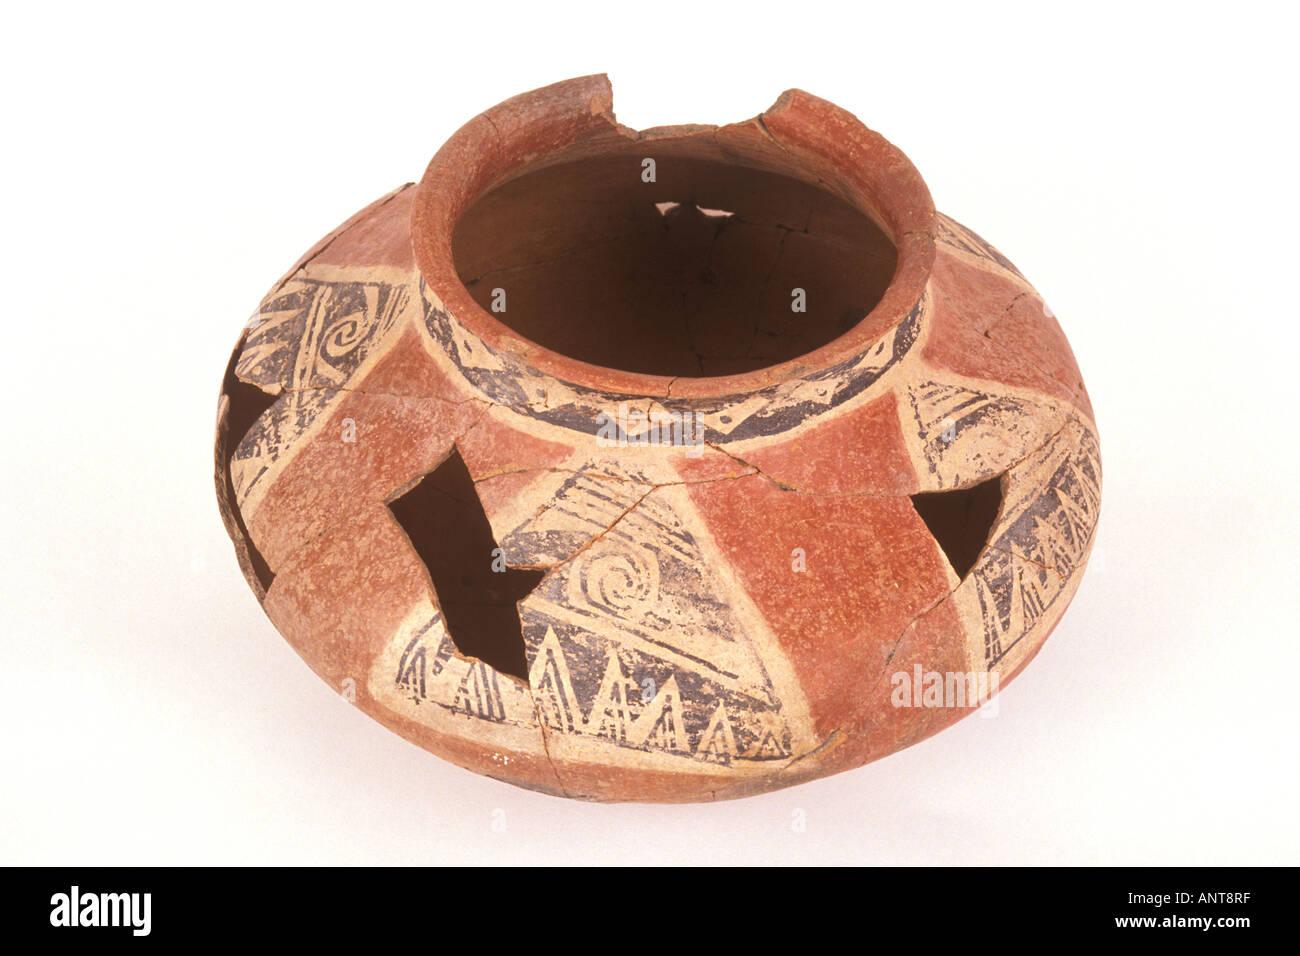 Fine Pot Stock Photos & Fine Pot Stock Images - Alamy